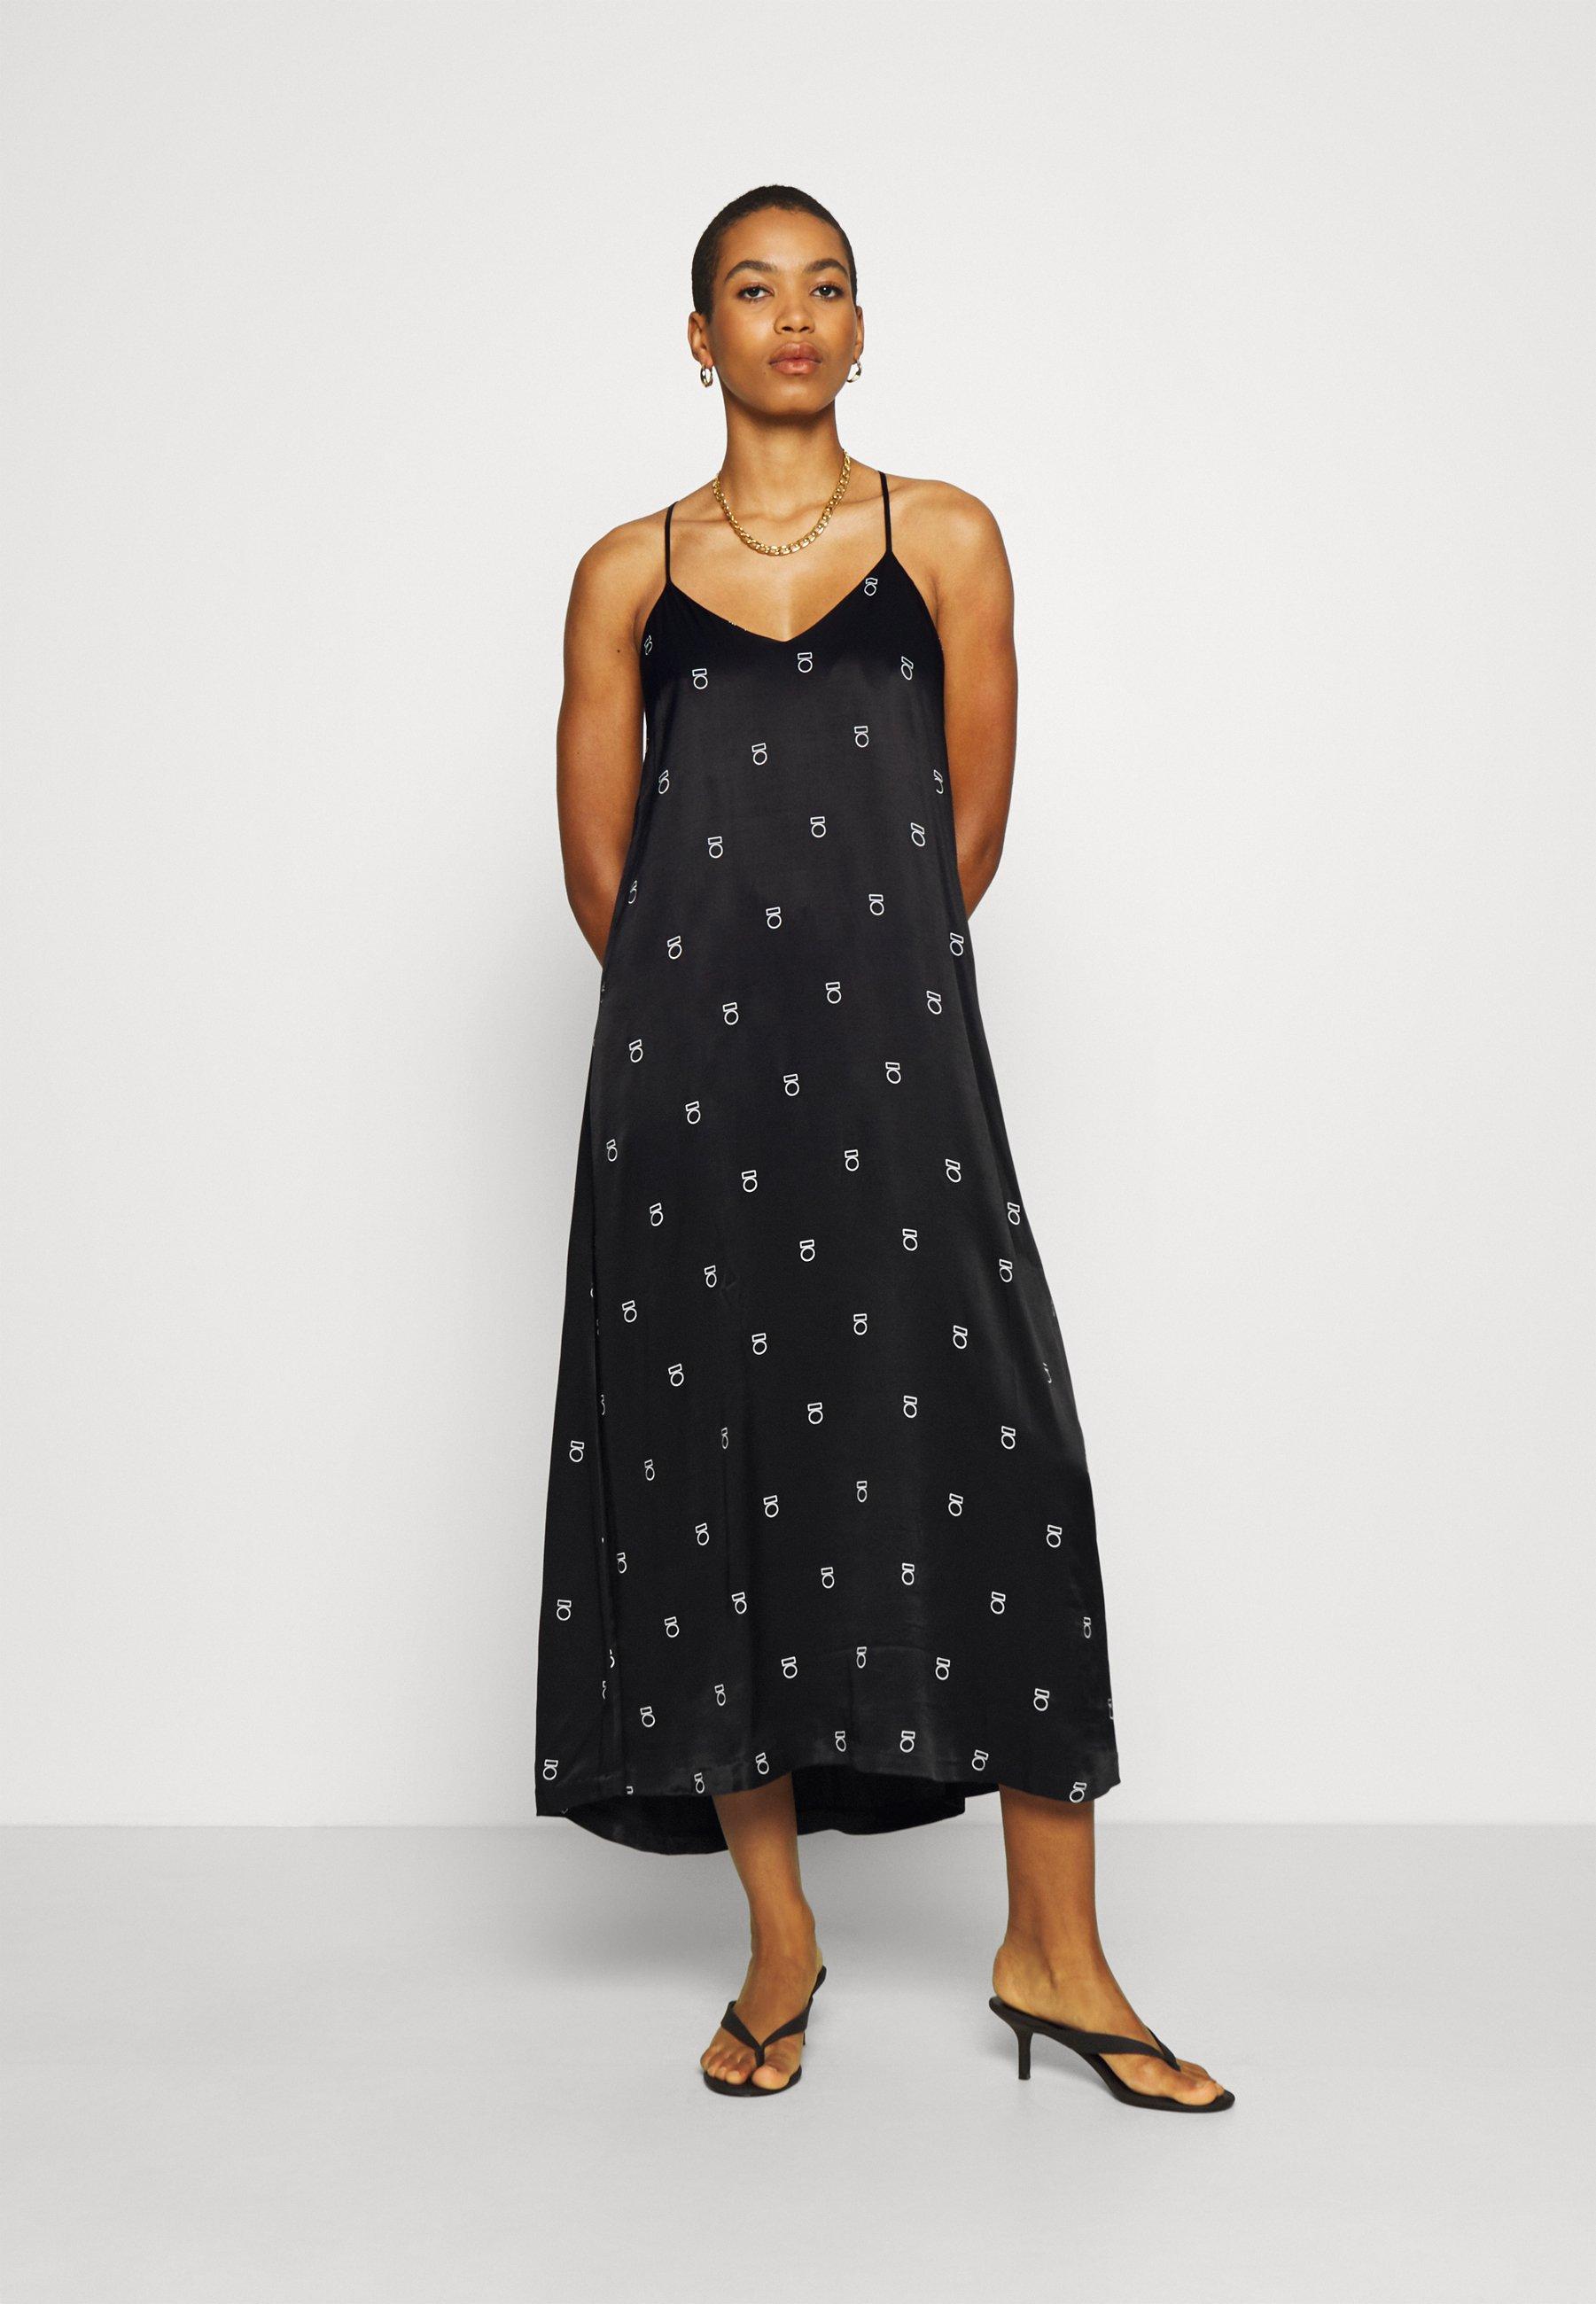 10DAYS LONG DRESS MEDAL - Robe longue - black - Robes femme CsN2X